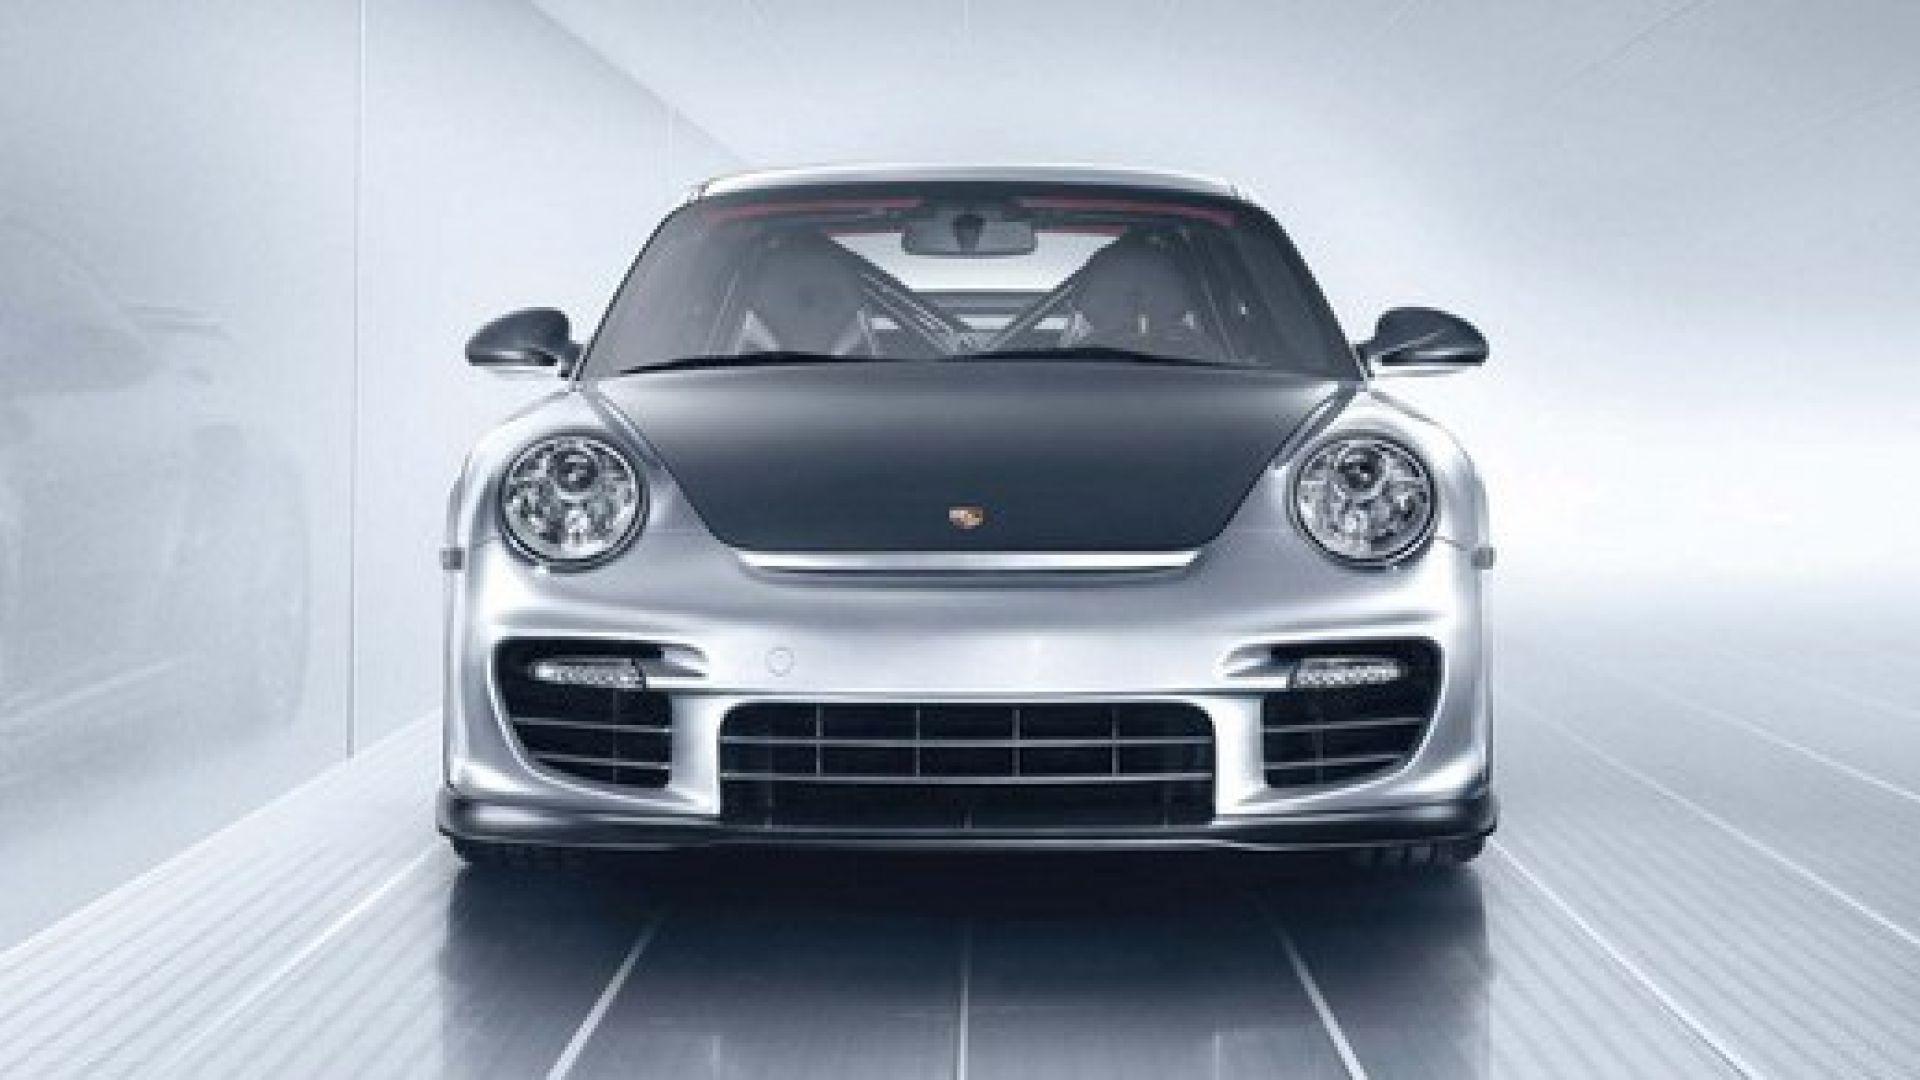 prossimamente porsche 911 gt2 rs in 56 immagini motorbox. Black Bedroom Furniture Sets. Home Design Ideas